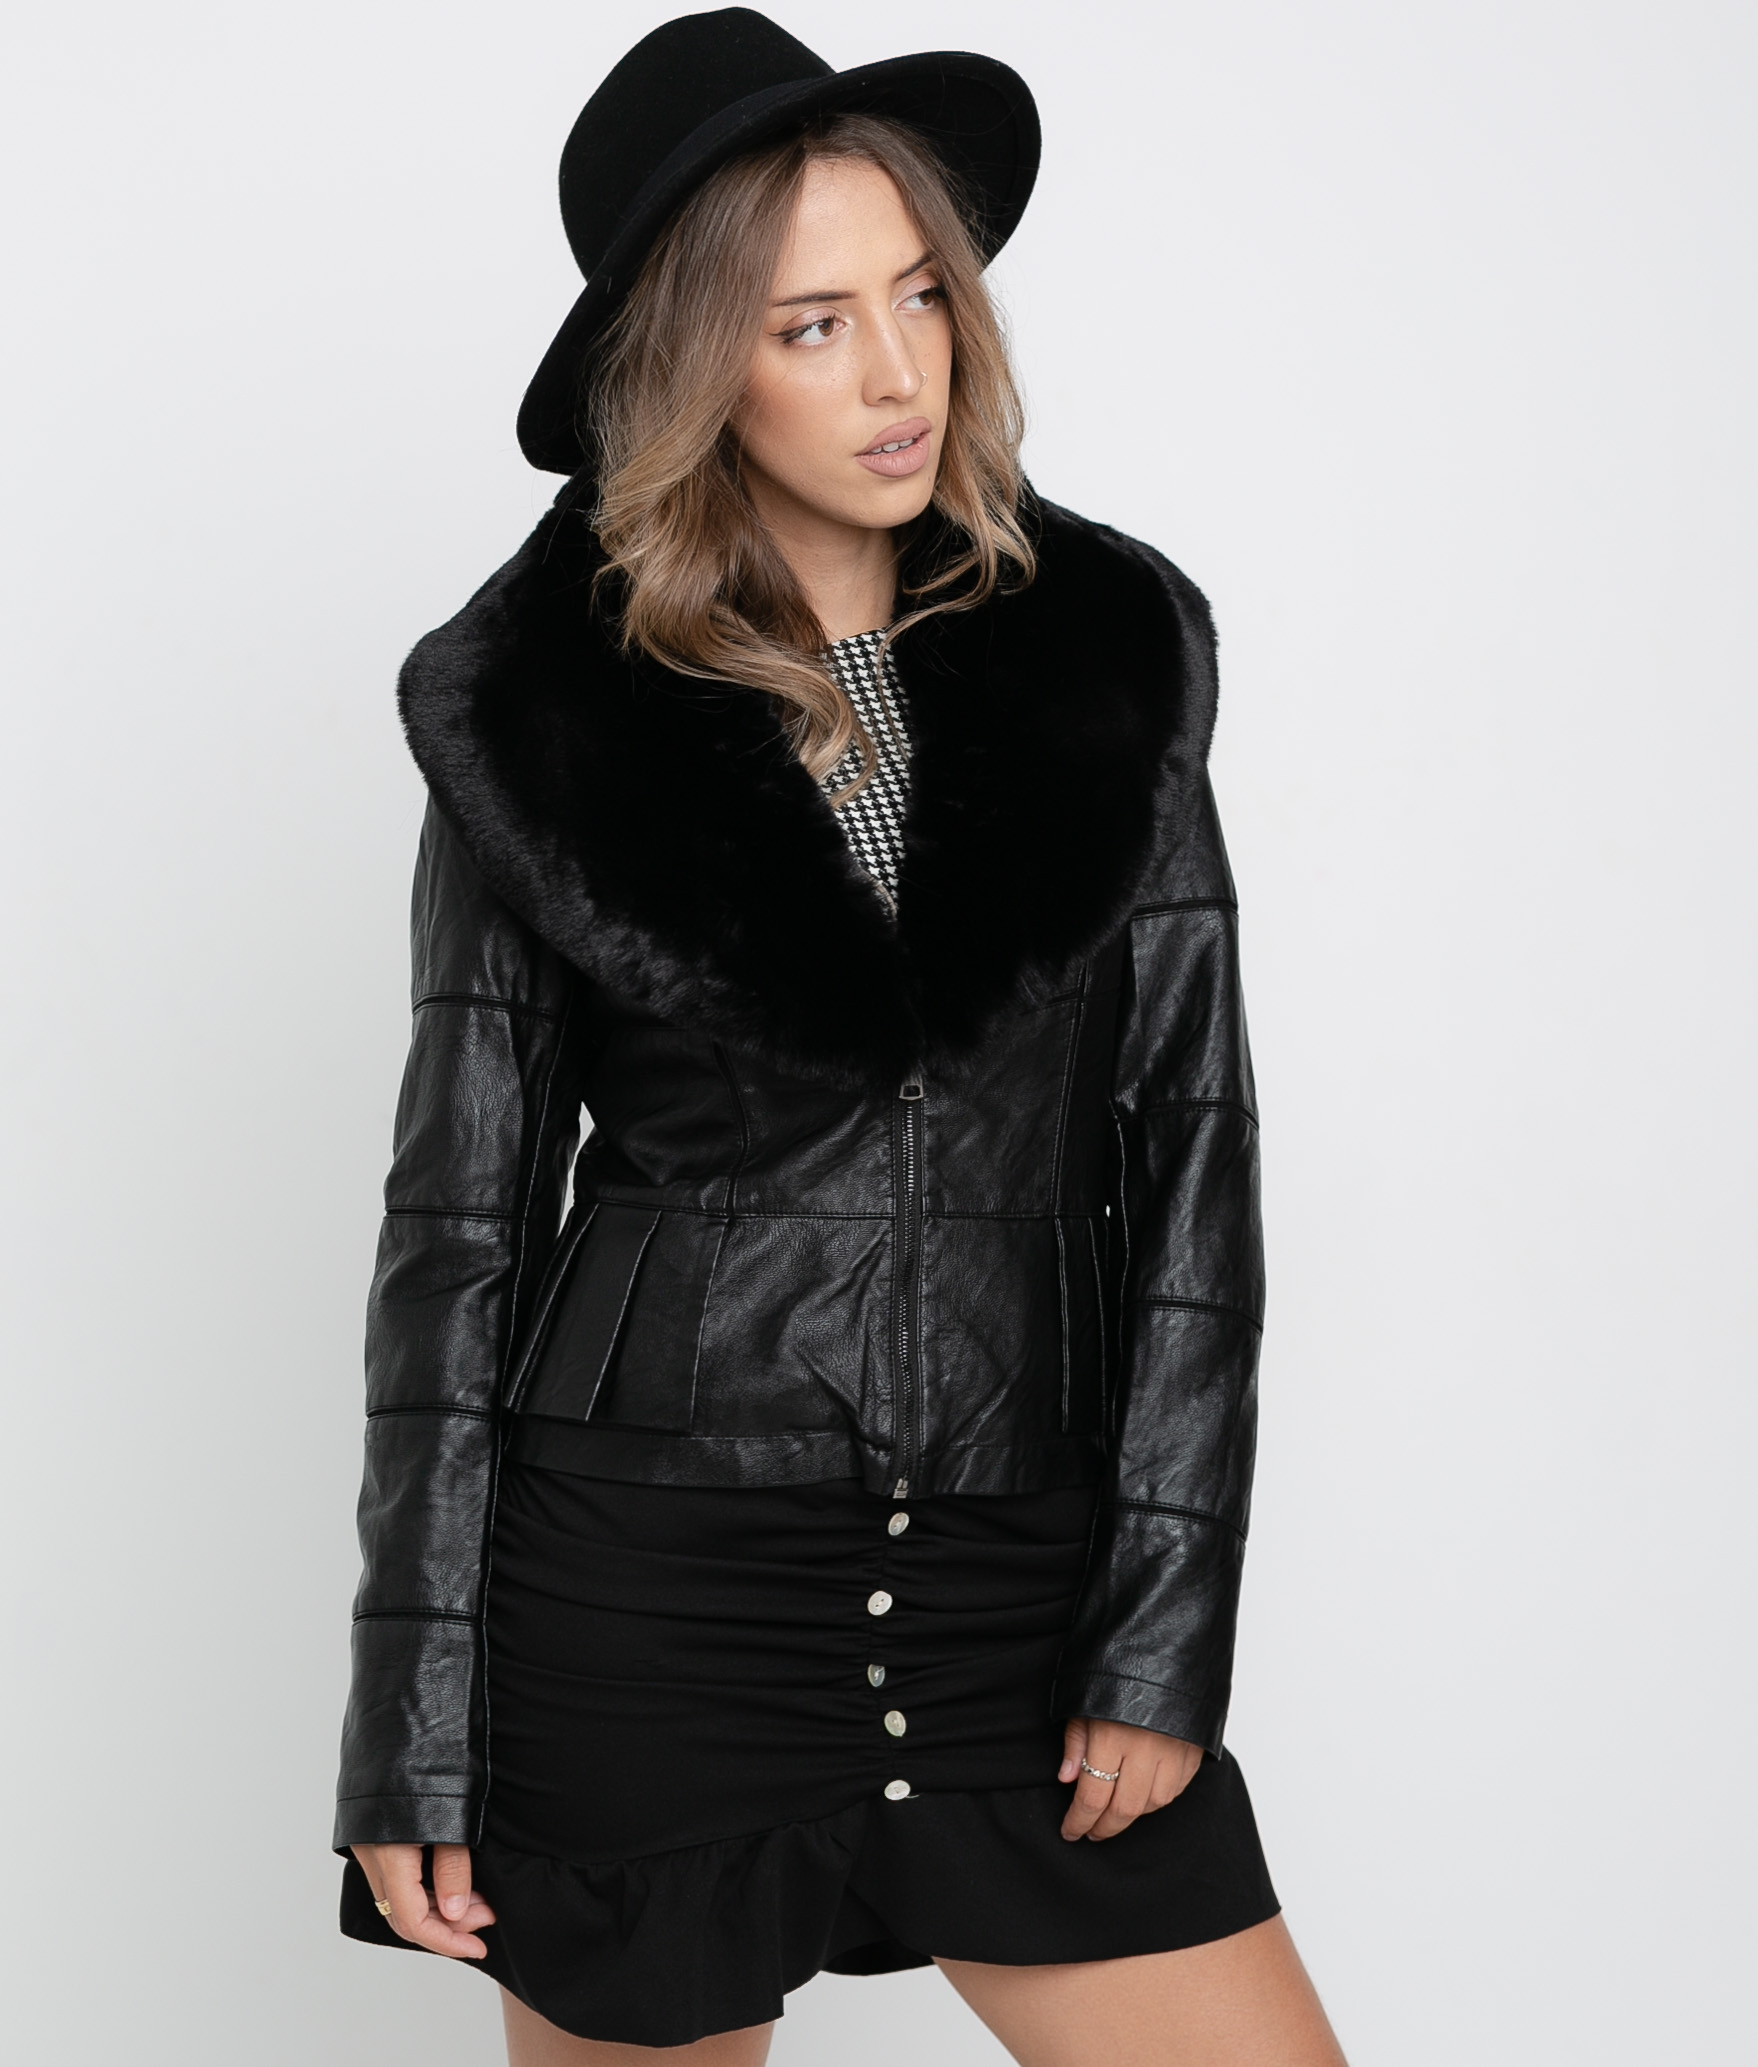 Riot Jacket - Black